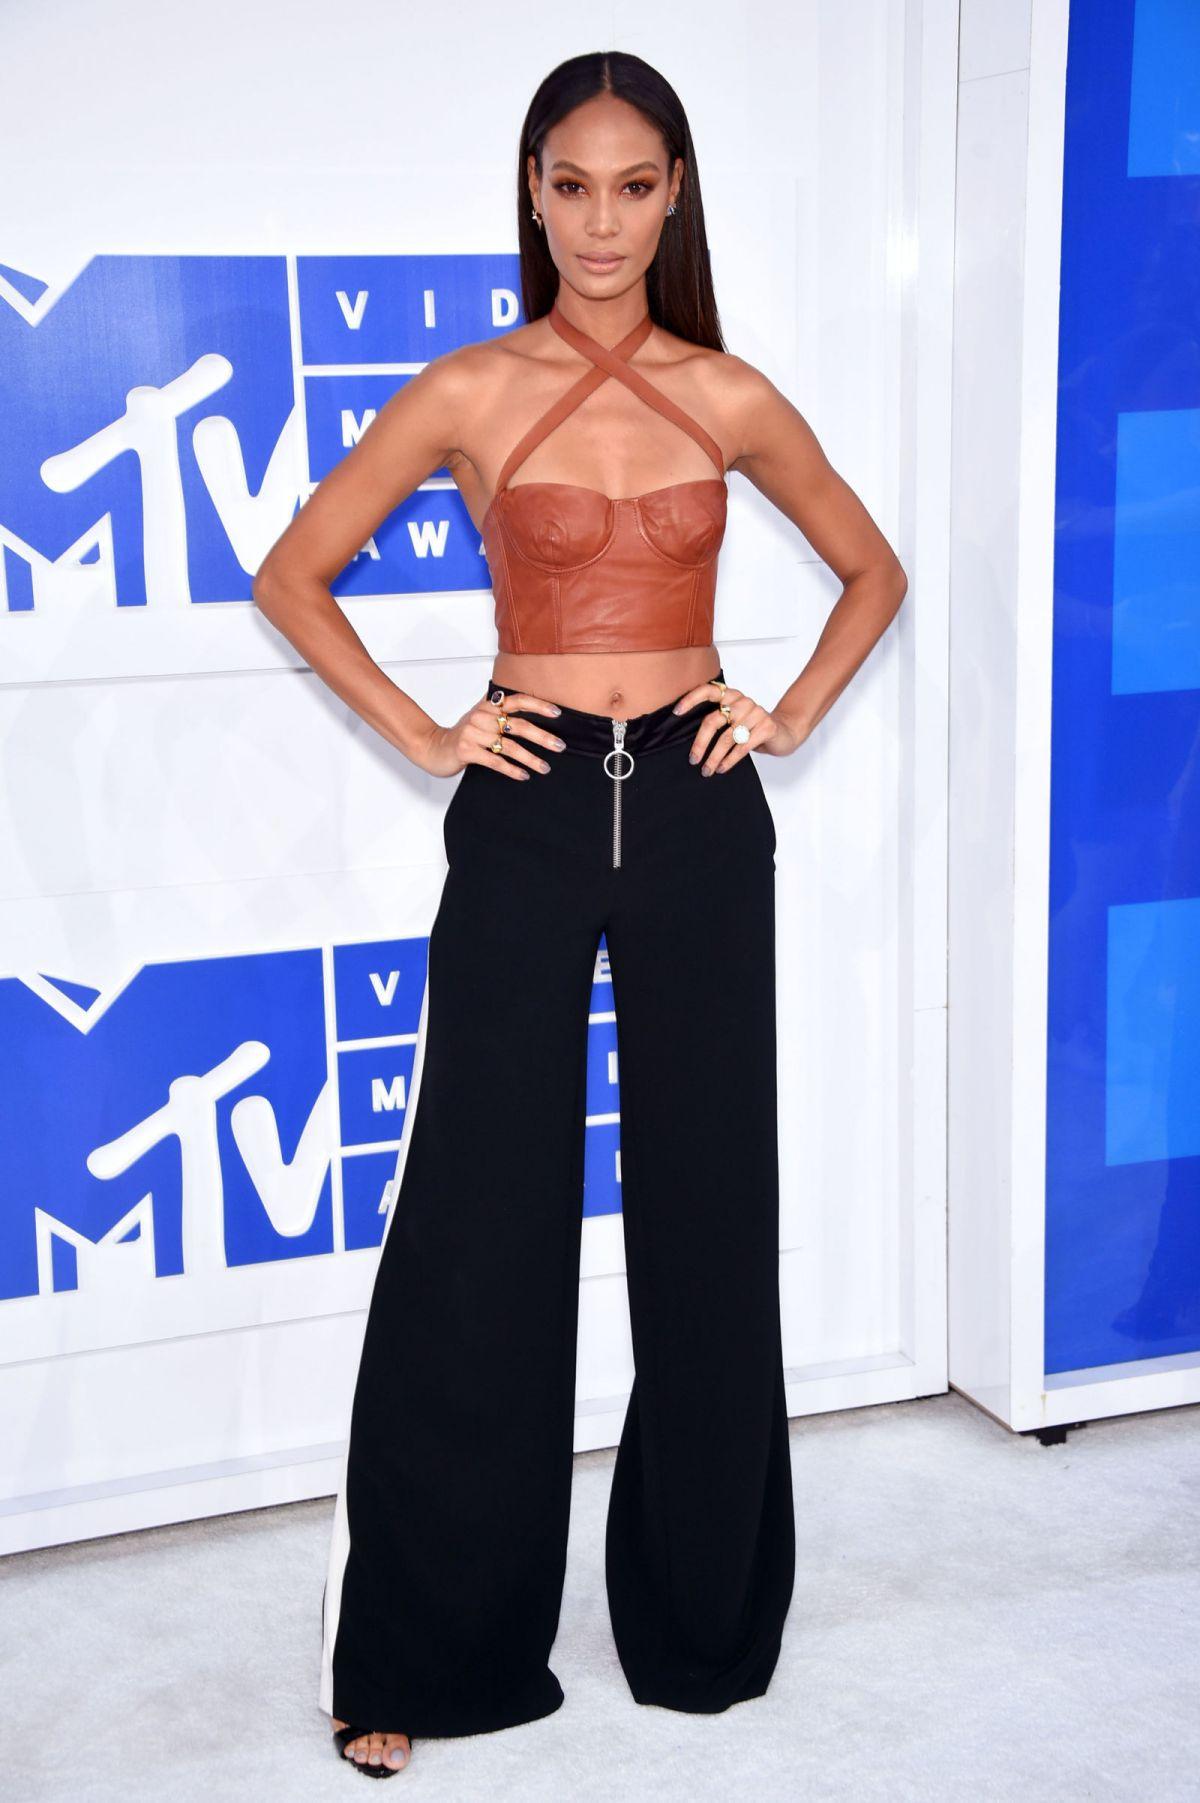 JOAN SMALLS at 2016 MTV Video Music Awards in New York 08/28/2016